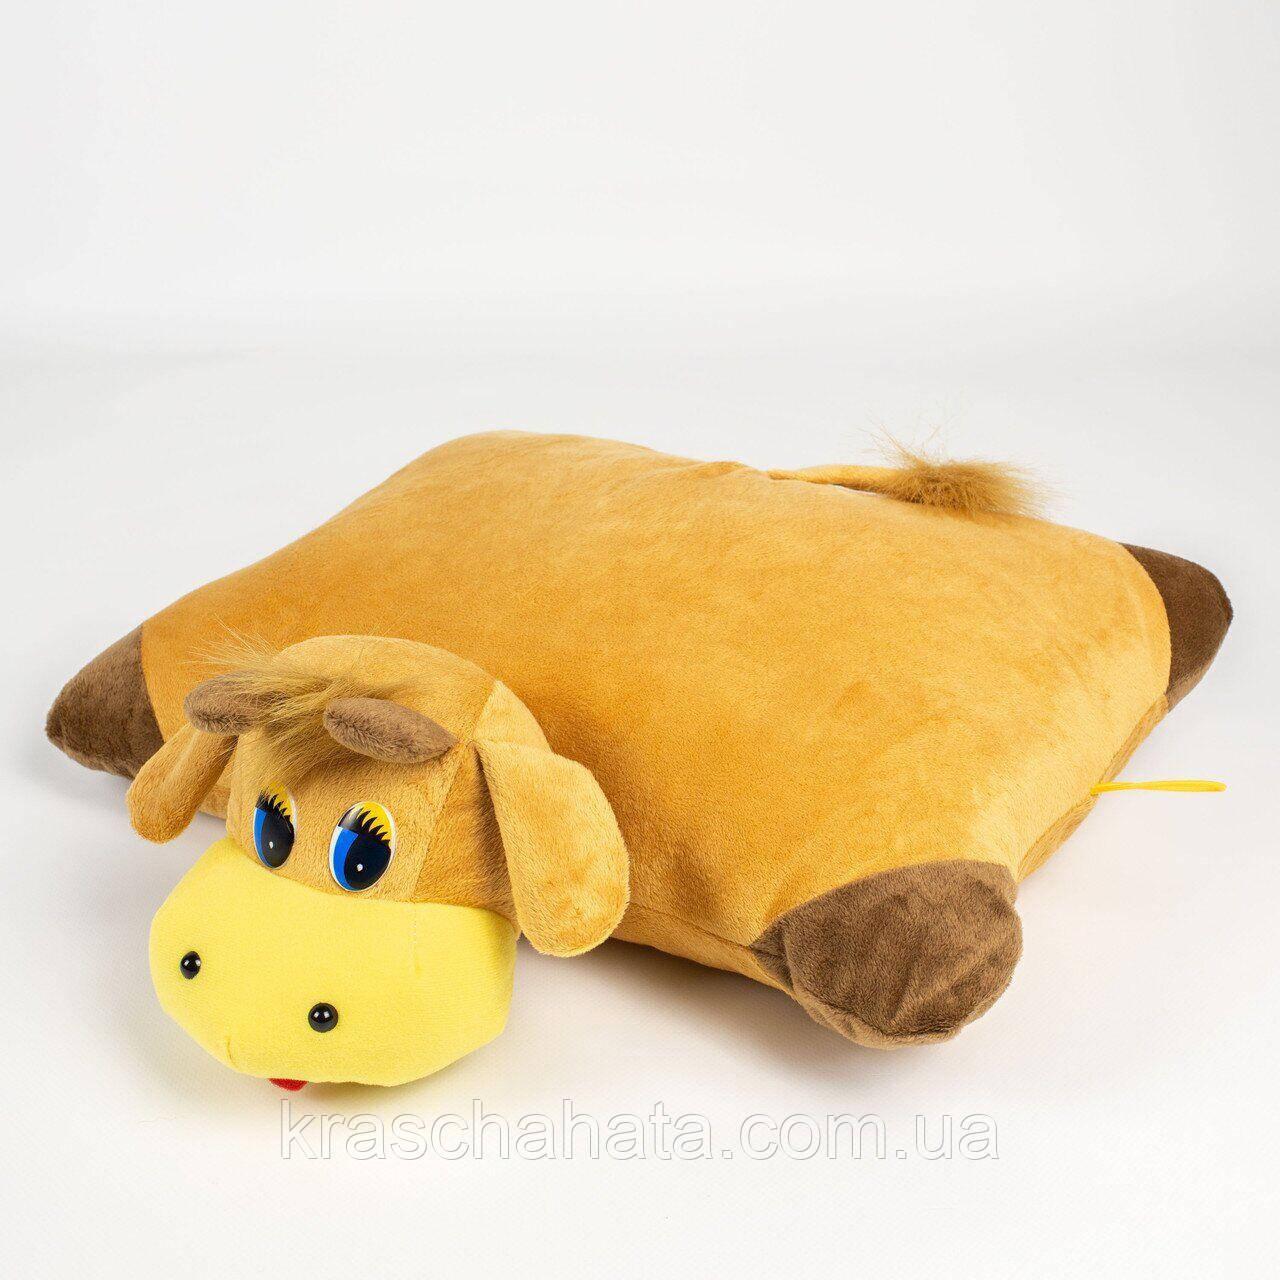 Коровка, мягкая игрушка-подушка, 37х37х16 см